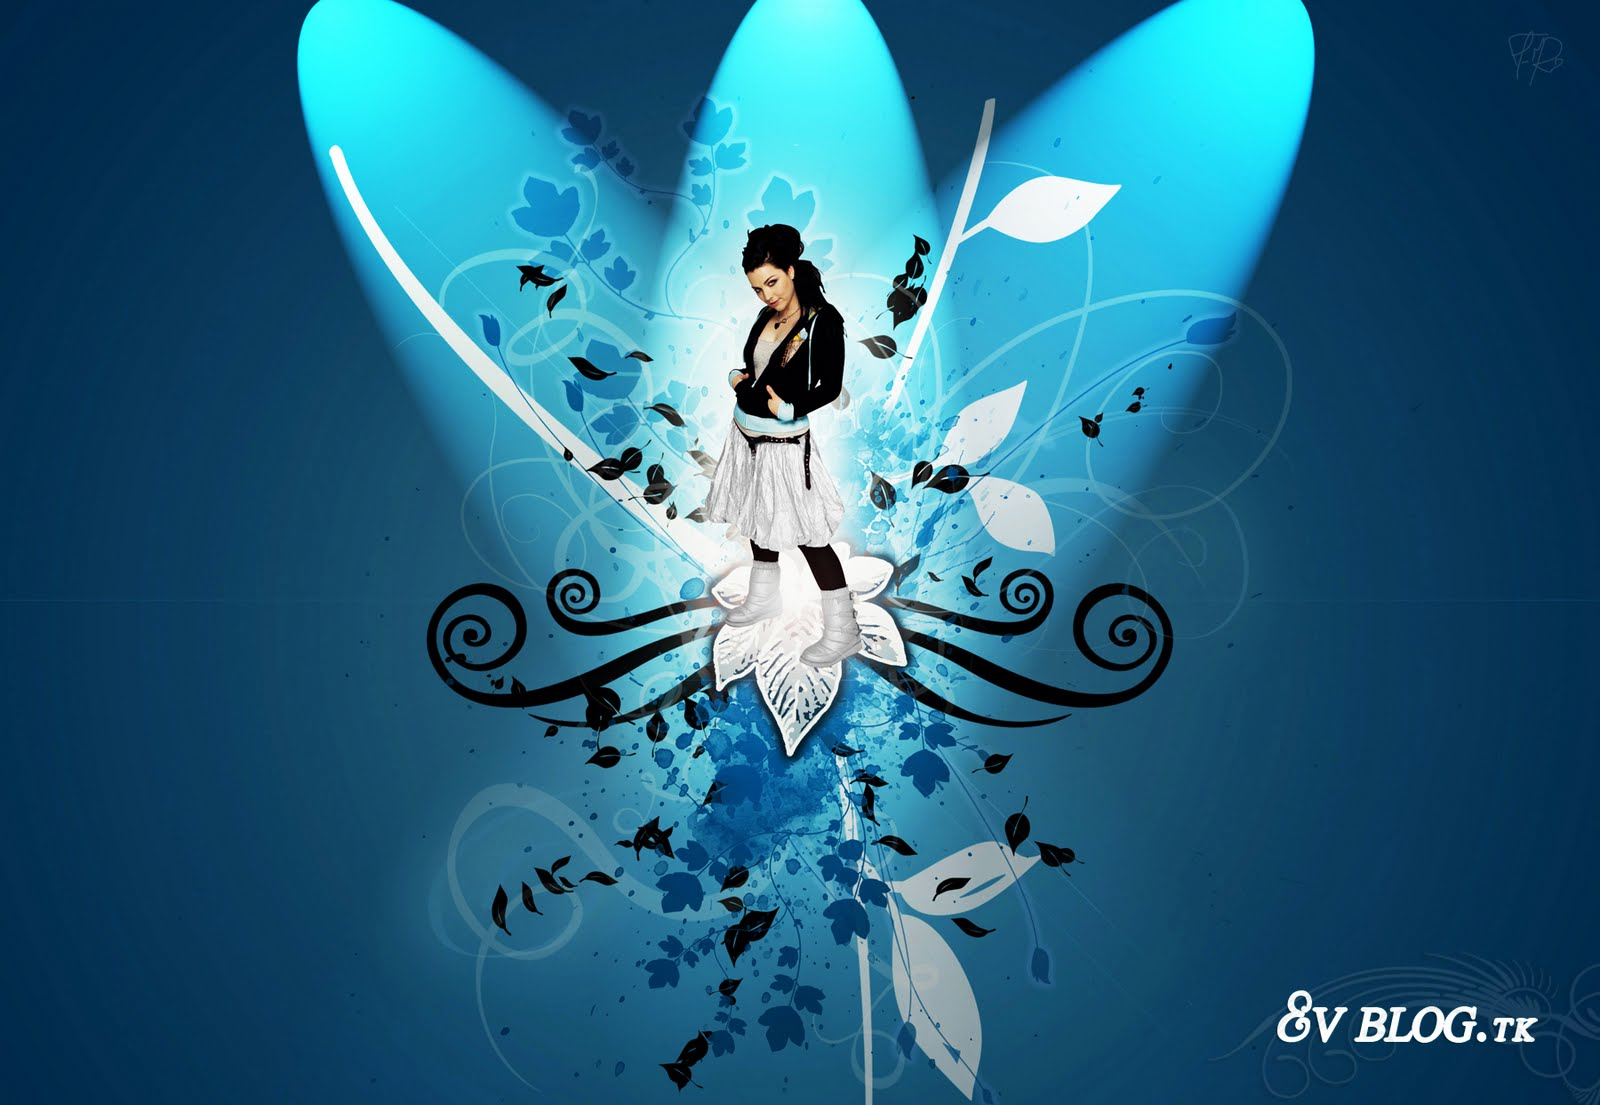 http://1.bp.blogspot.com/_ZEkPBYQoi08/TApr19qxgLI/AAAAAAAABHs/Hv-u06DpS7M/s1600/FONDO+DE+PANTALLA.jpg